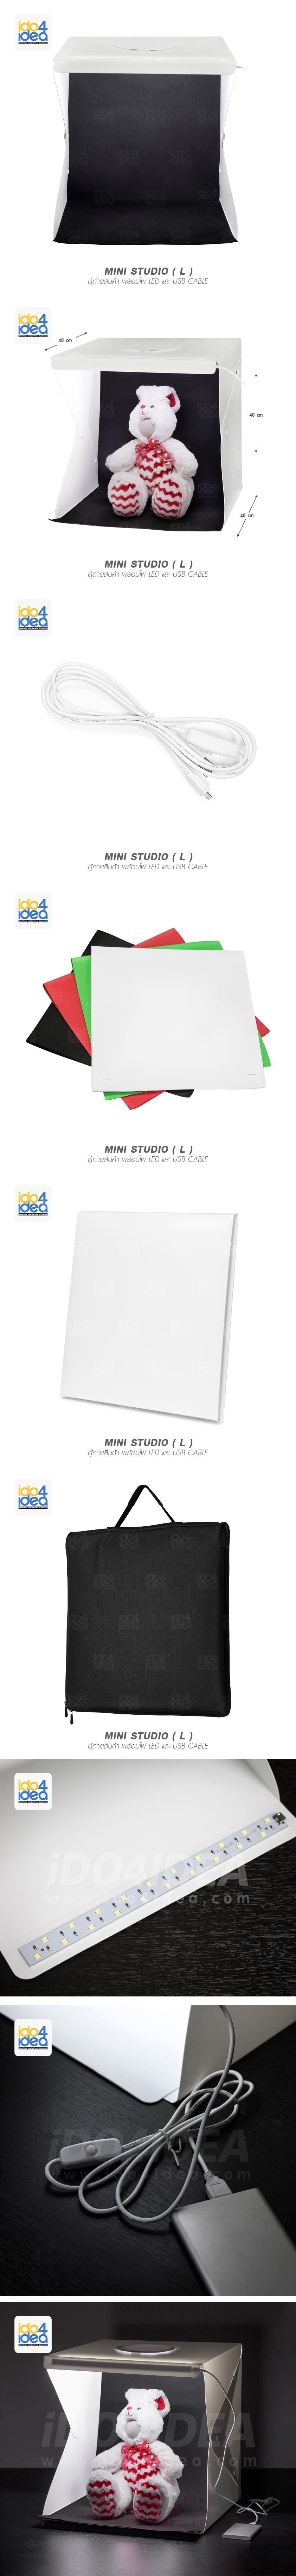 Mini Studio L ขนาด 40*40*40 ซม ไฟ LED และ USB Cable (backdrops 4สี เขียว,ดำ,แดง,ขาว)